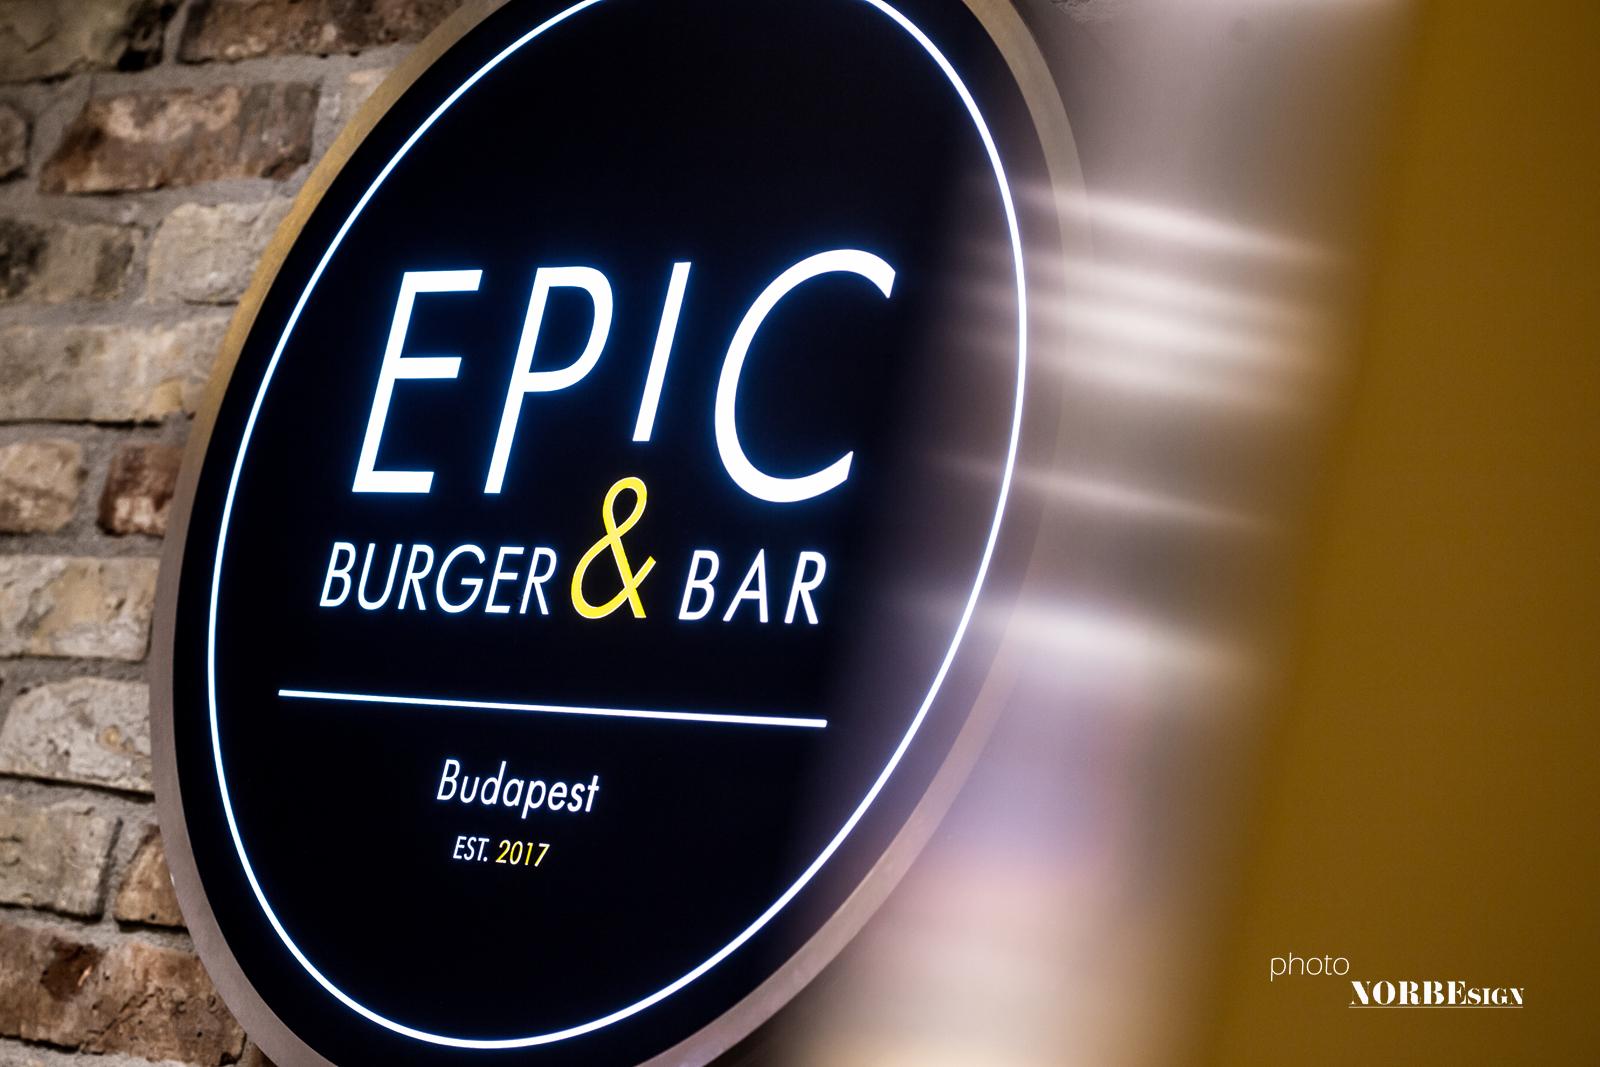 epicburger_18_02_23_14.jpg